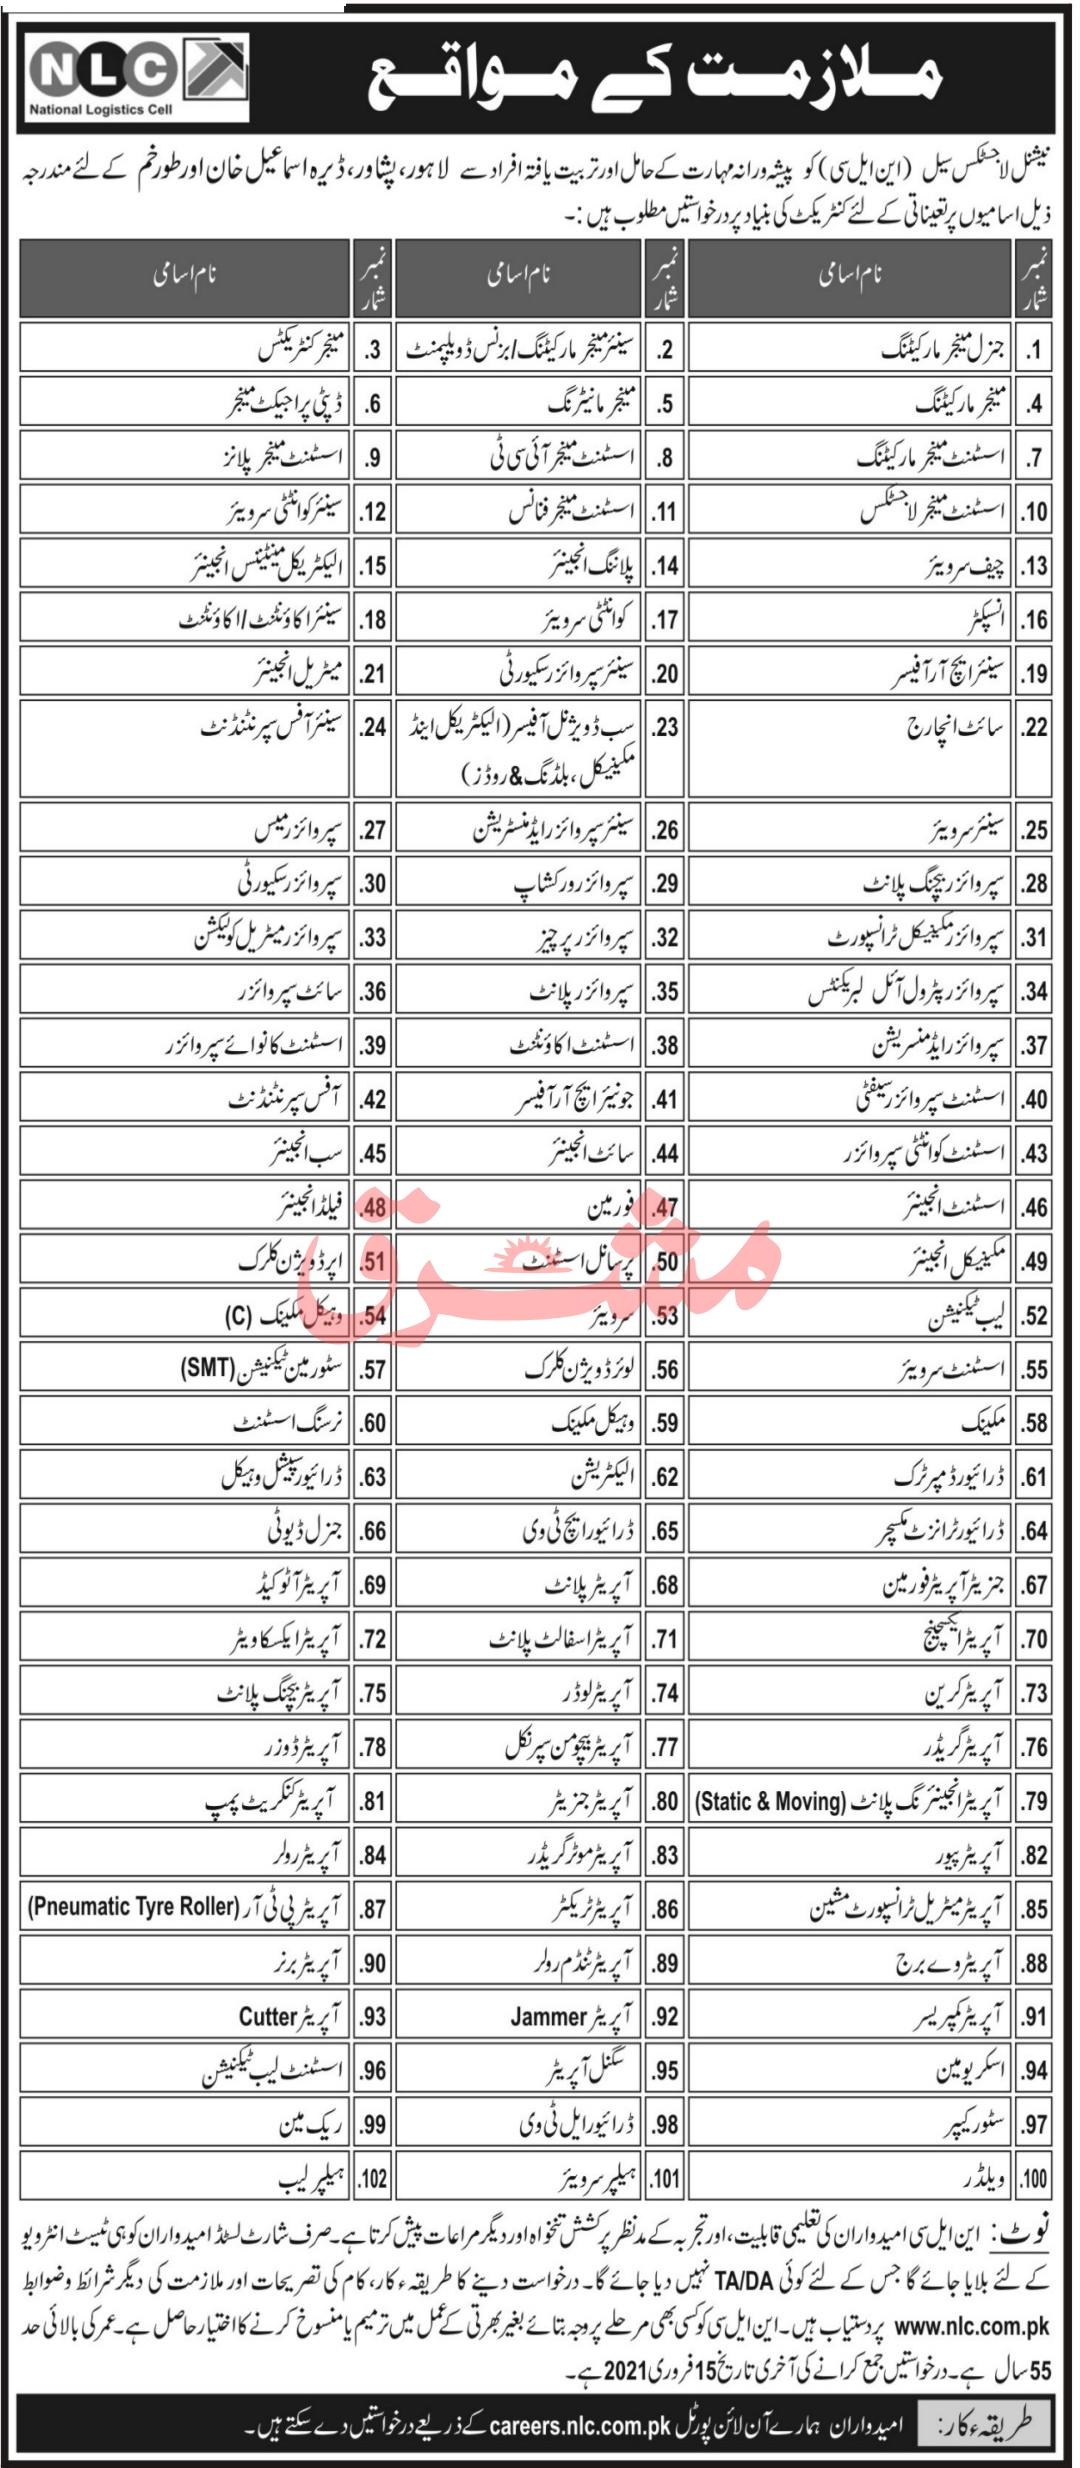 NLC Jobs 2021 Online Application Form - careers.nlc.com.pk - NLC Vacancies - NLC Job Vacancy - NLC Latest Jobs - National Logistic Cell Jobs - NLC Pakistan Jobs